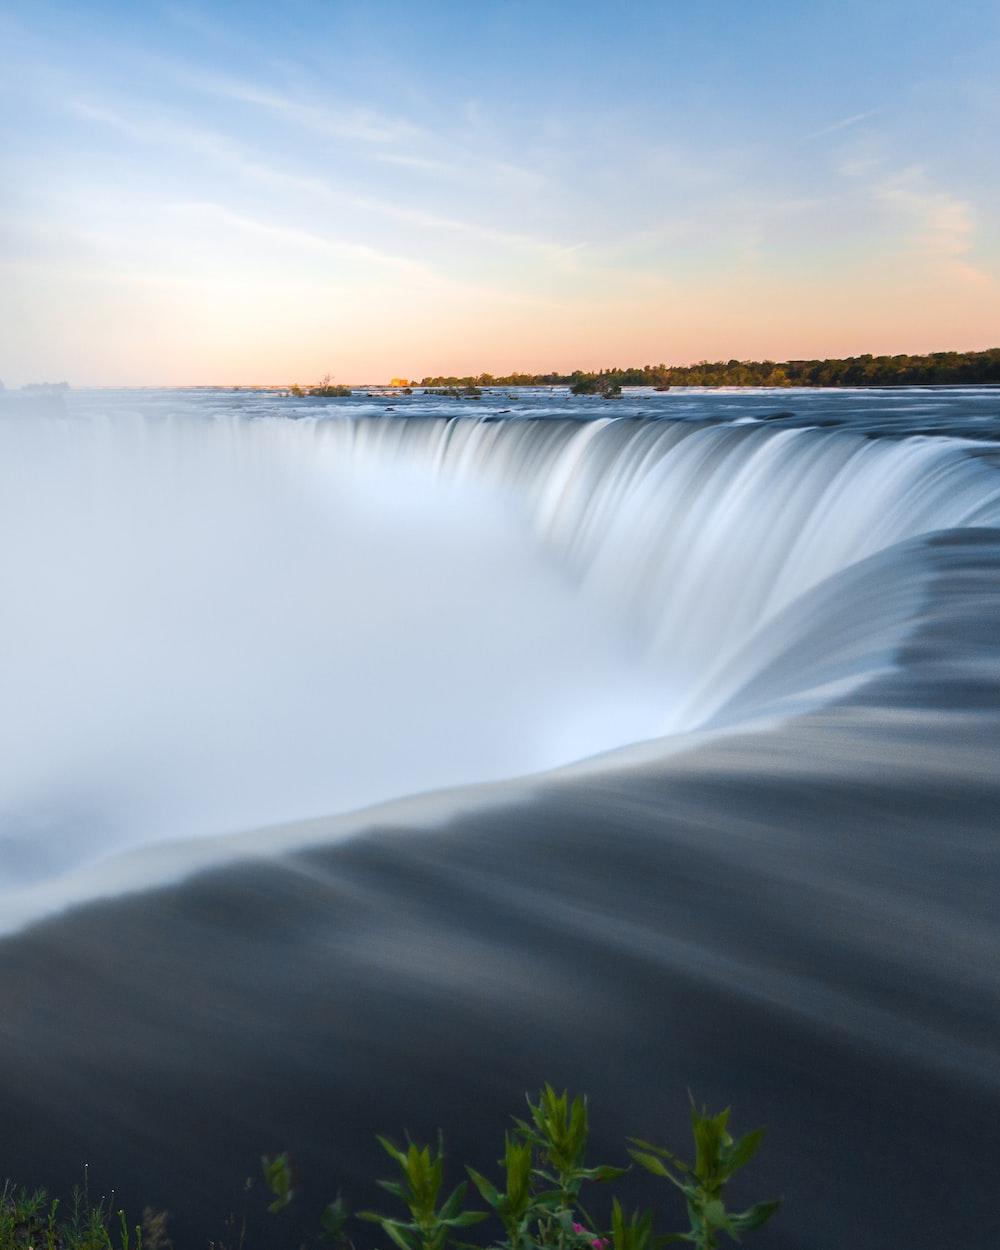 timelapse photography of Niagara falls